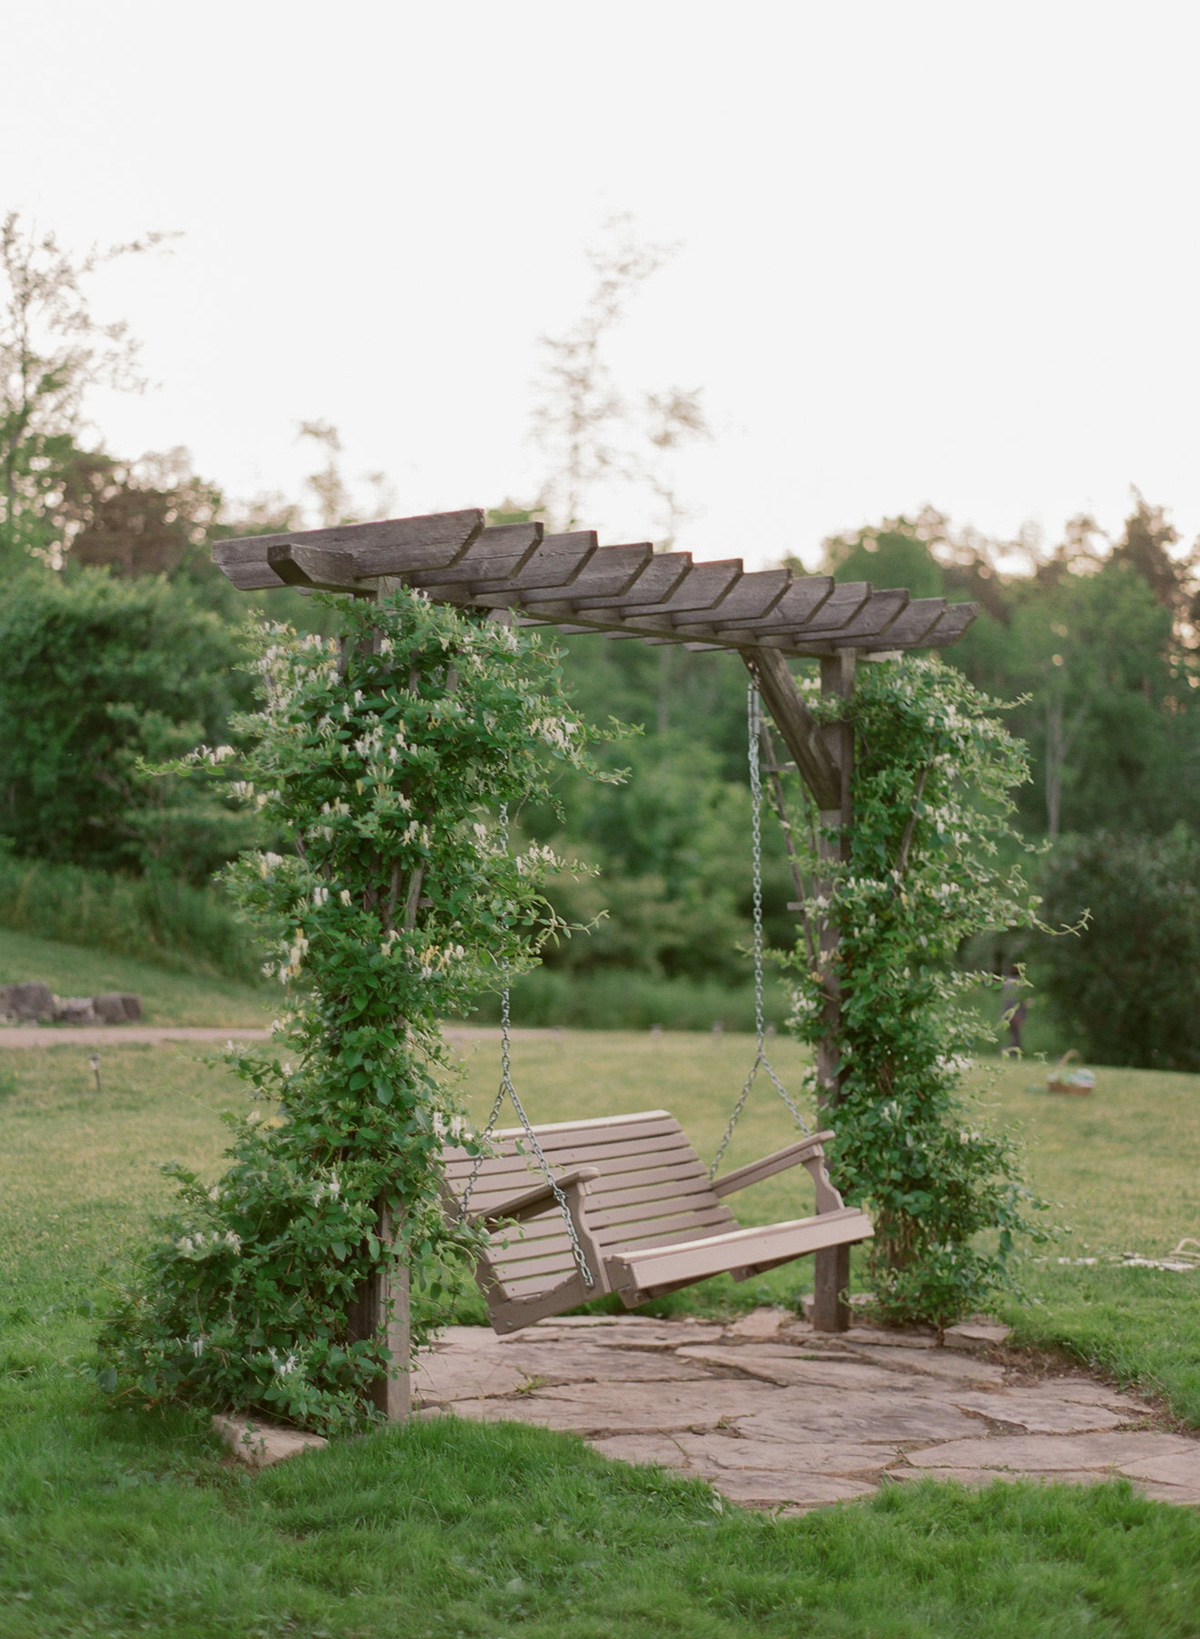 artiese-studios-vineyard-bride-swish-list-private-estate-cambridge-wedding-34.jpg